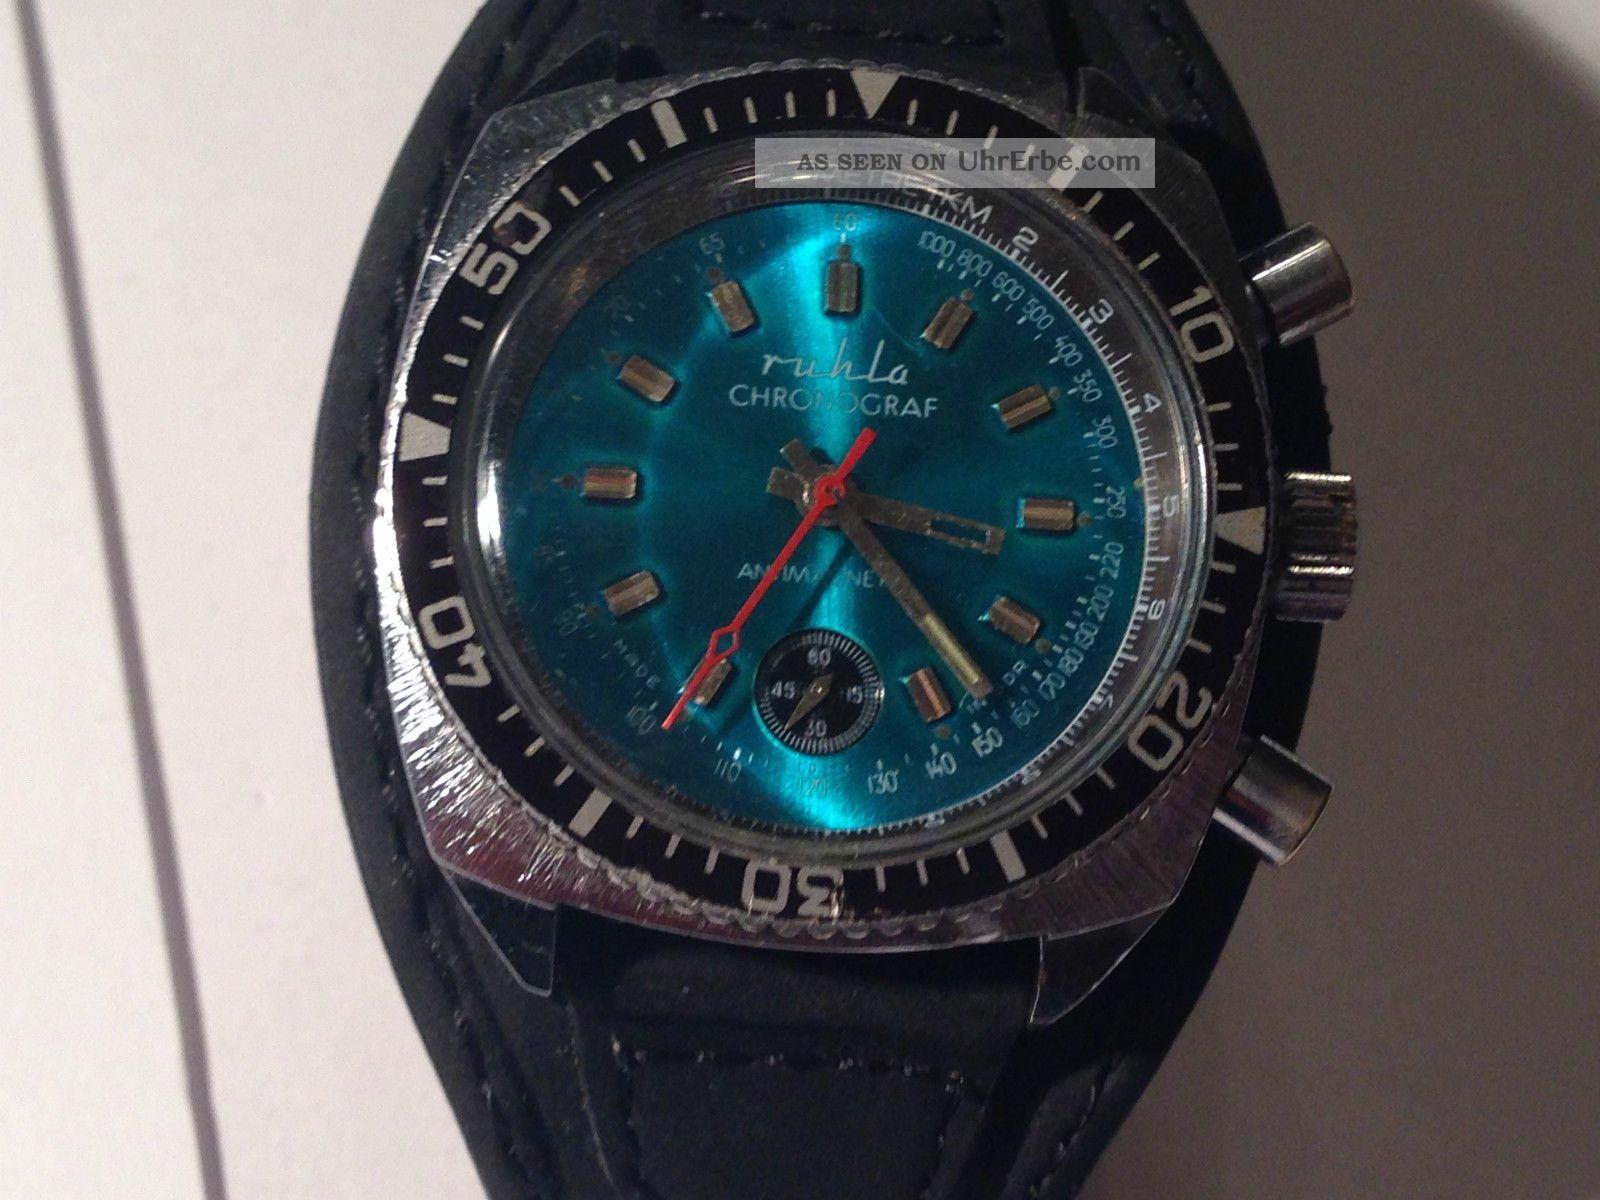 Ruhla Chronograph Herren Armband Uhr,  Sammler Uhr Armbanduhren Bild